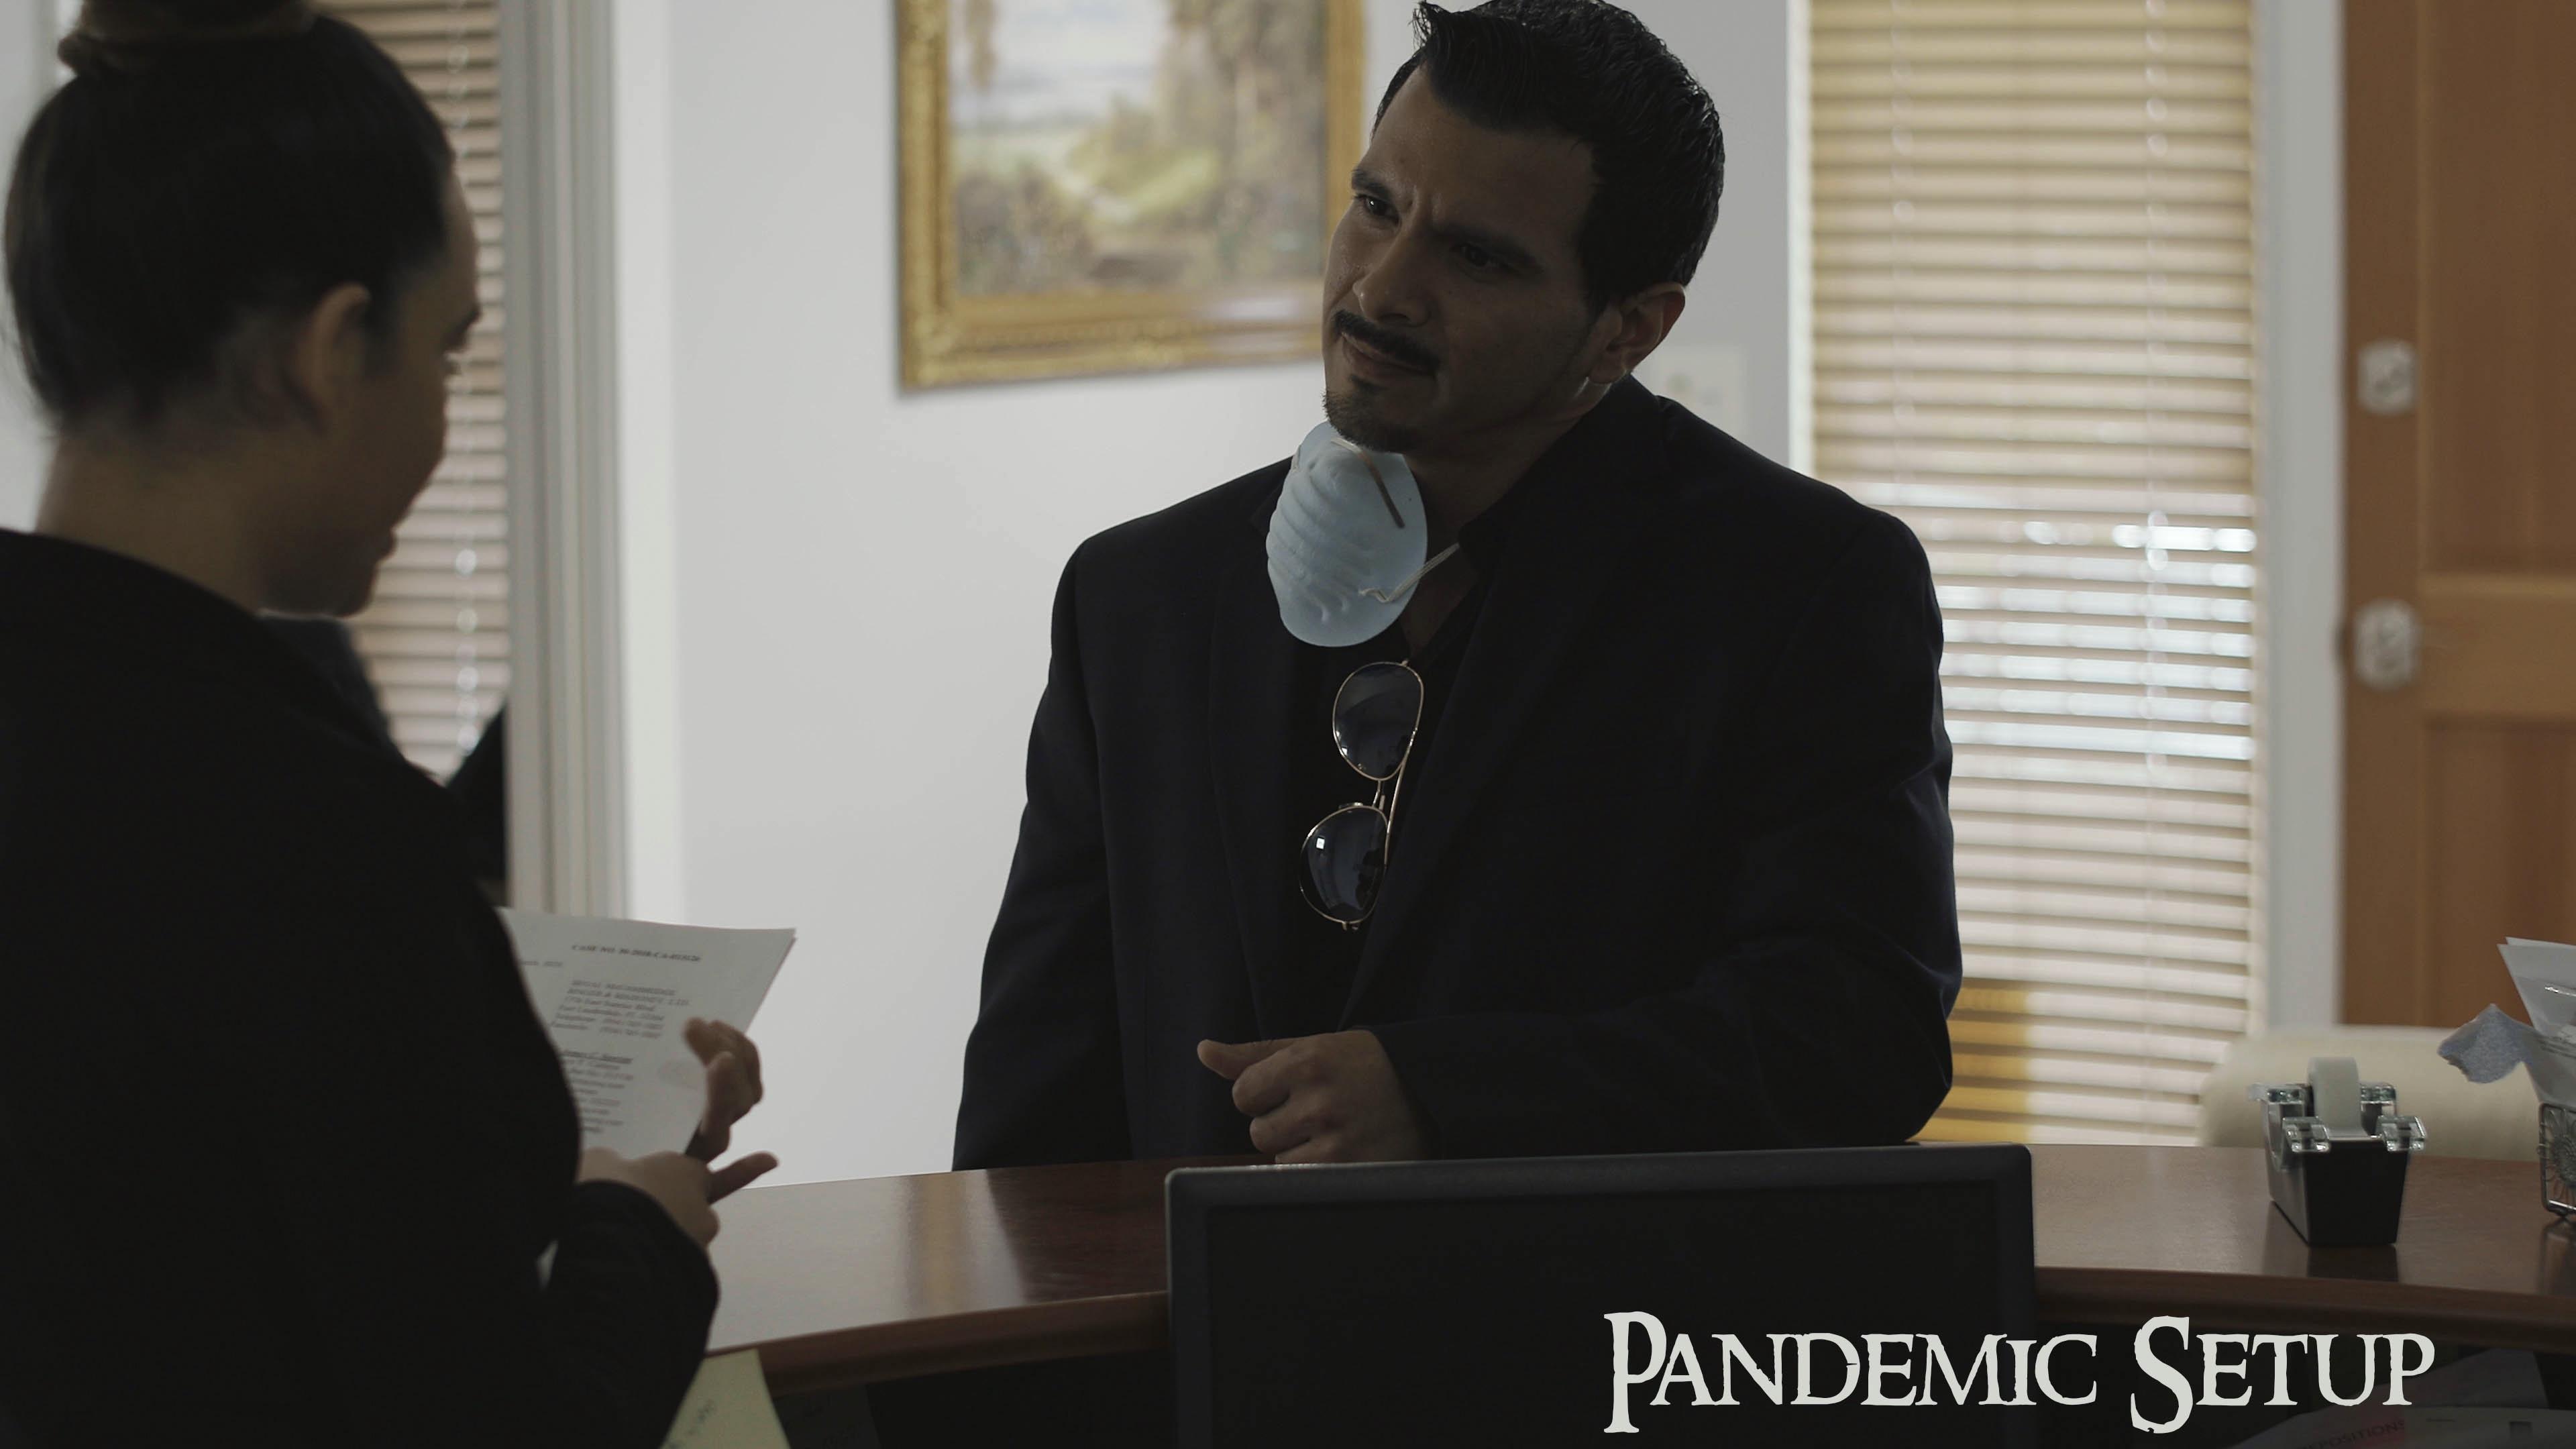 Naima Segui and Lee Silva in Pandemic Setup (2020)